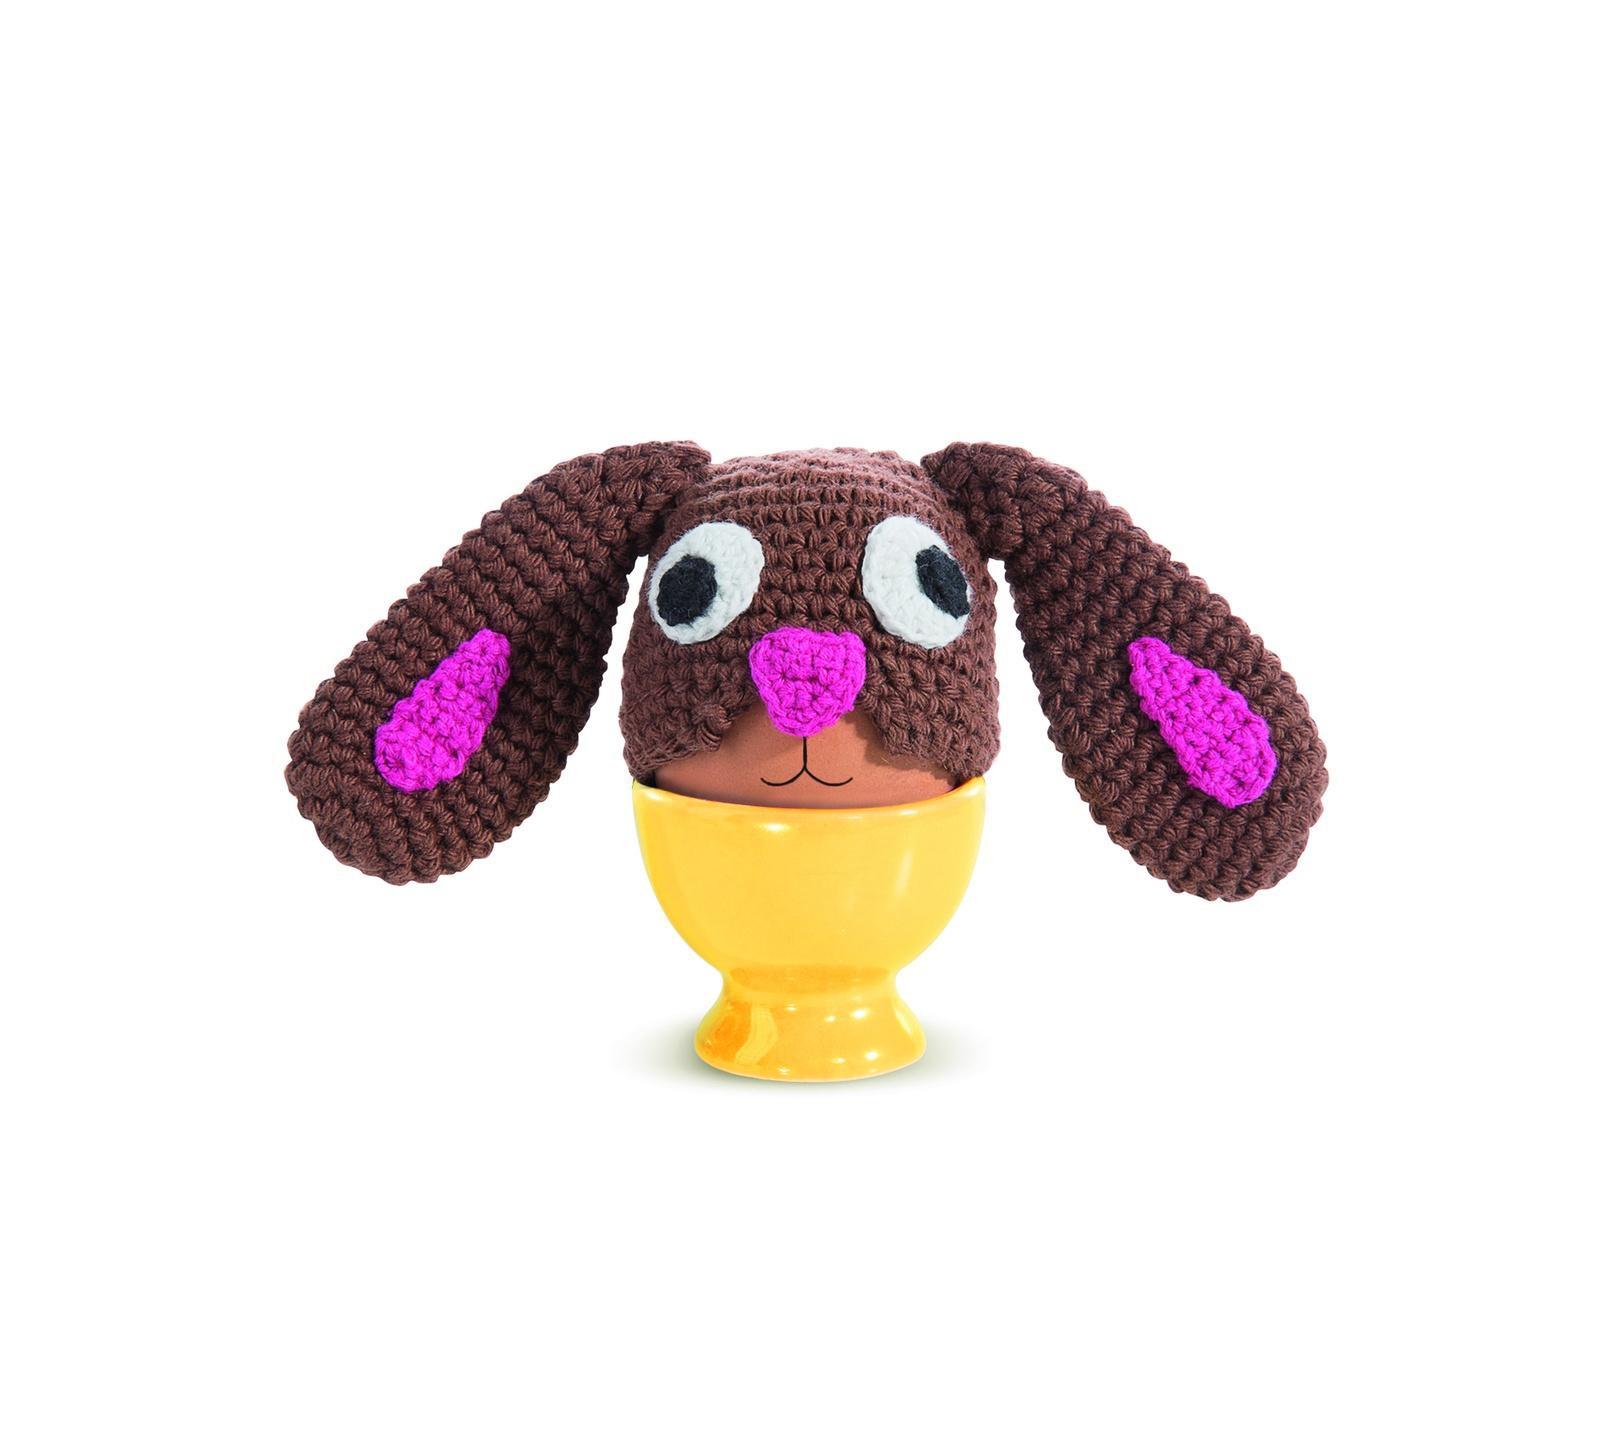 Чехол для яиц Donkey products Egg Bandit, цвет: коричневый, желтый цена